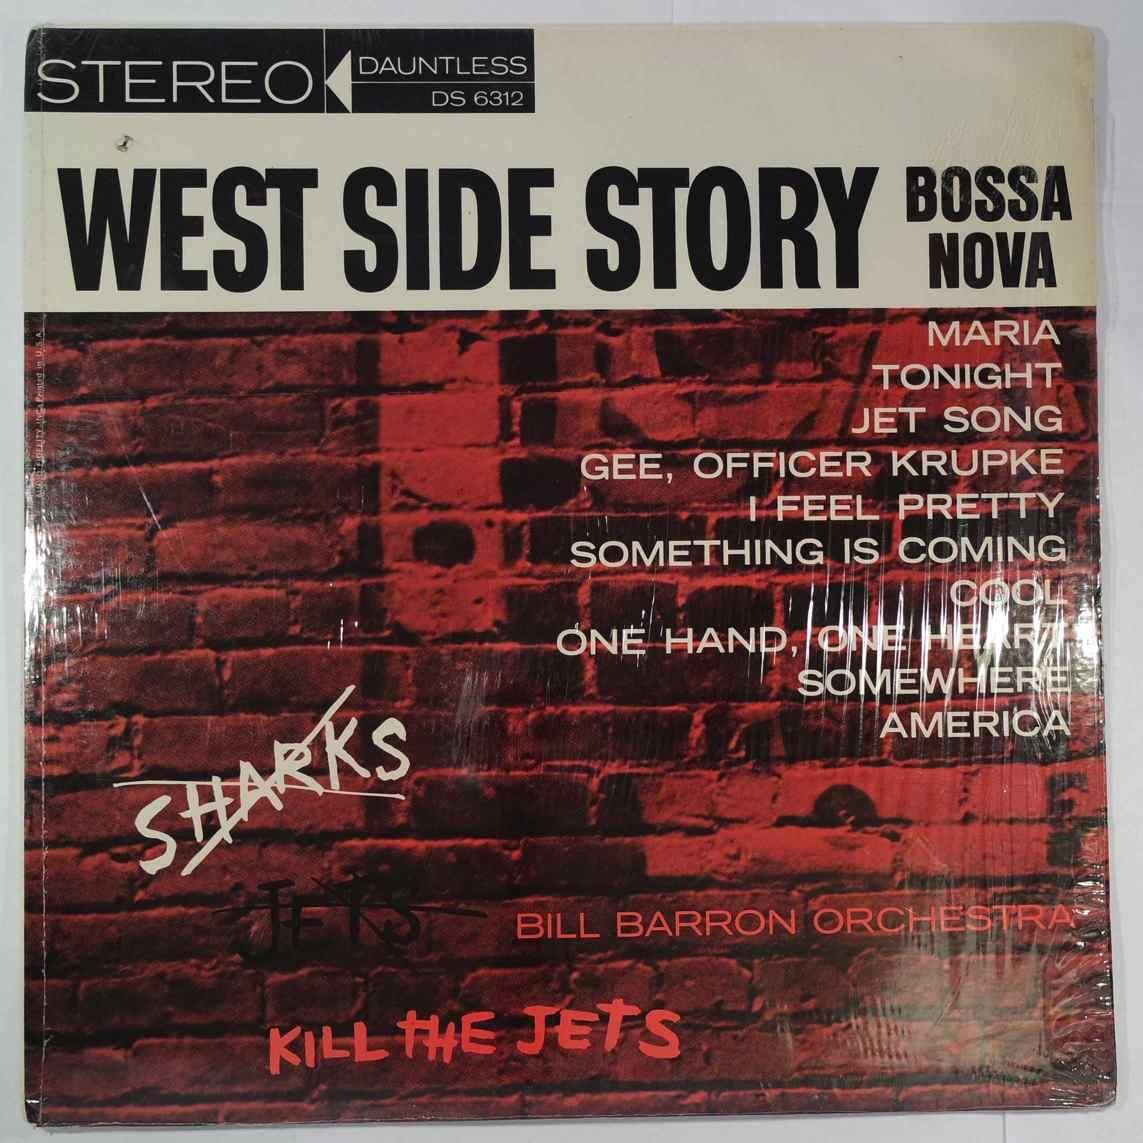 Bill Barron Orchestra West Side Story Bossa Nova